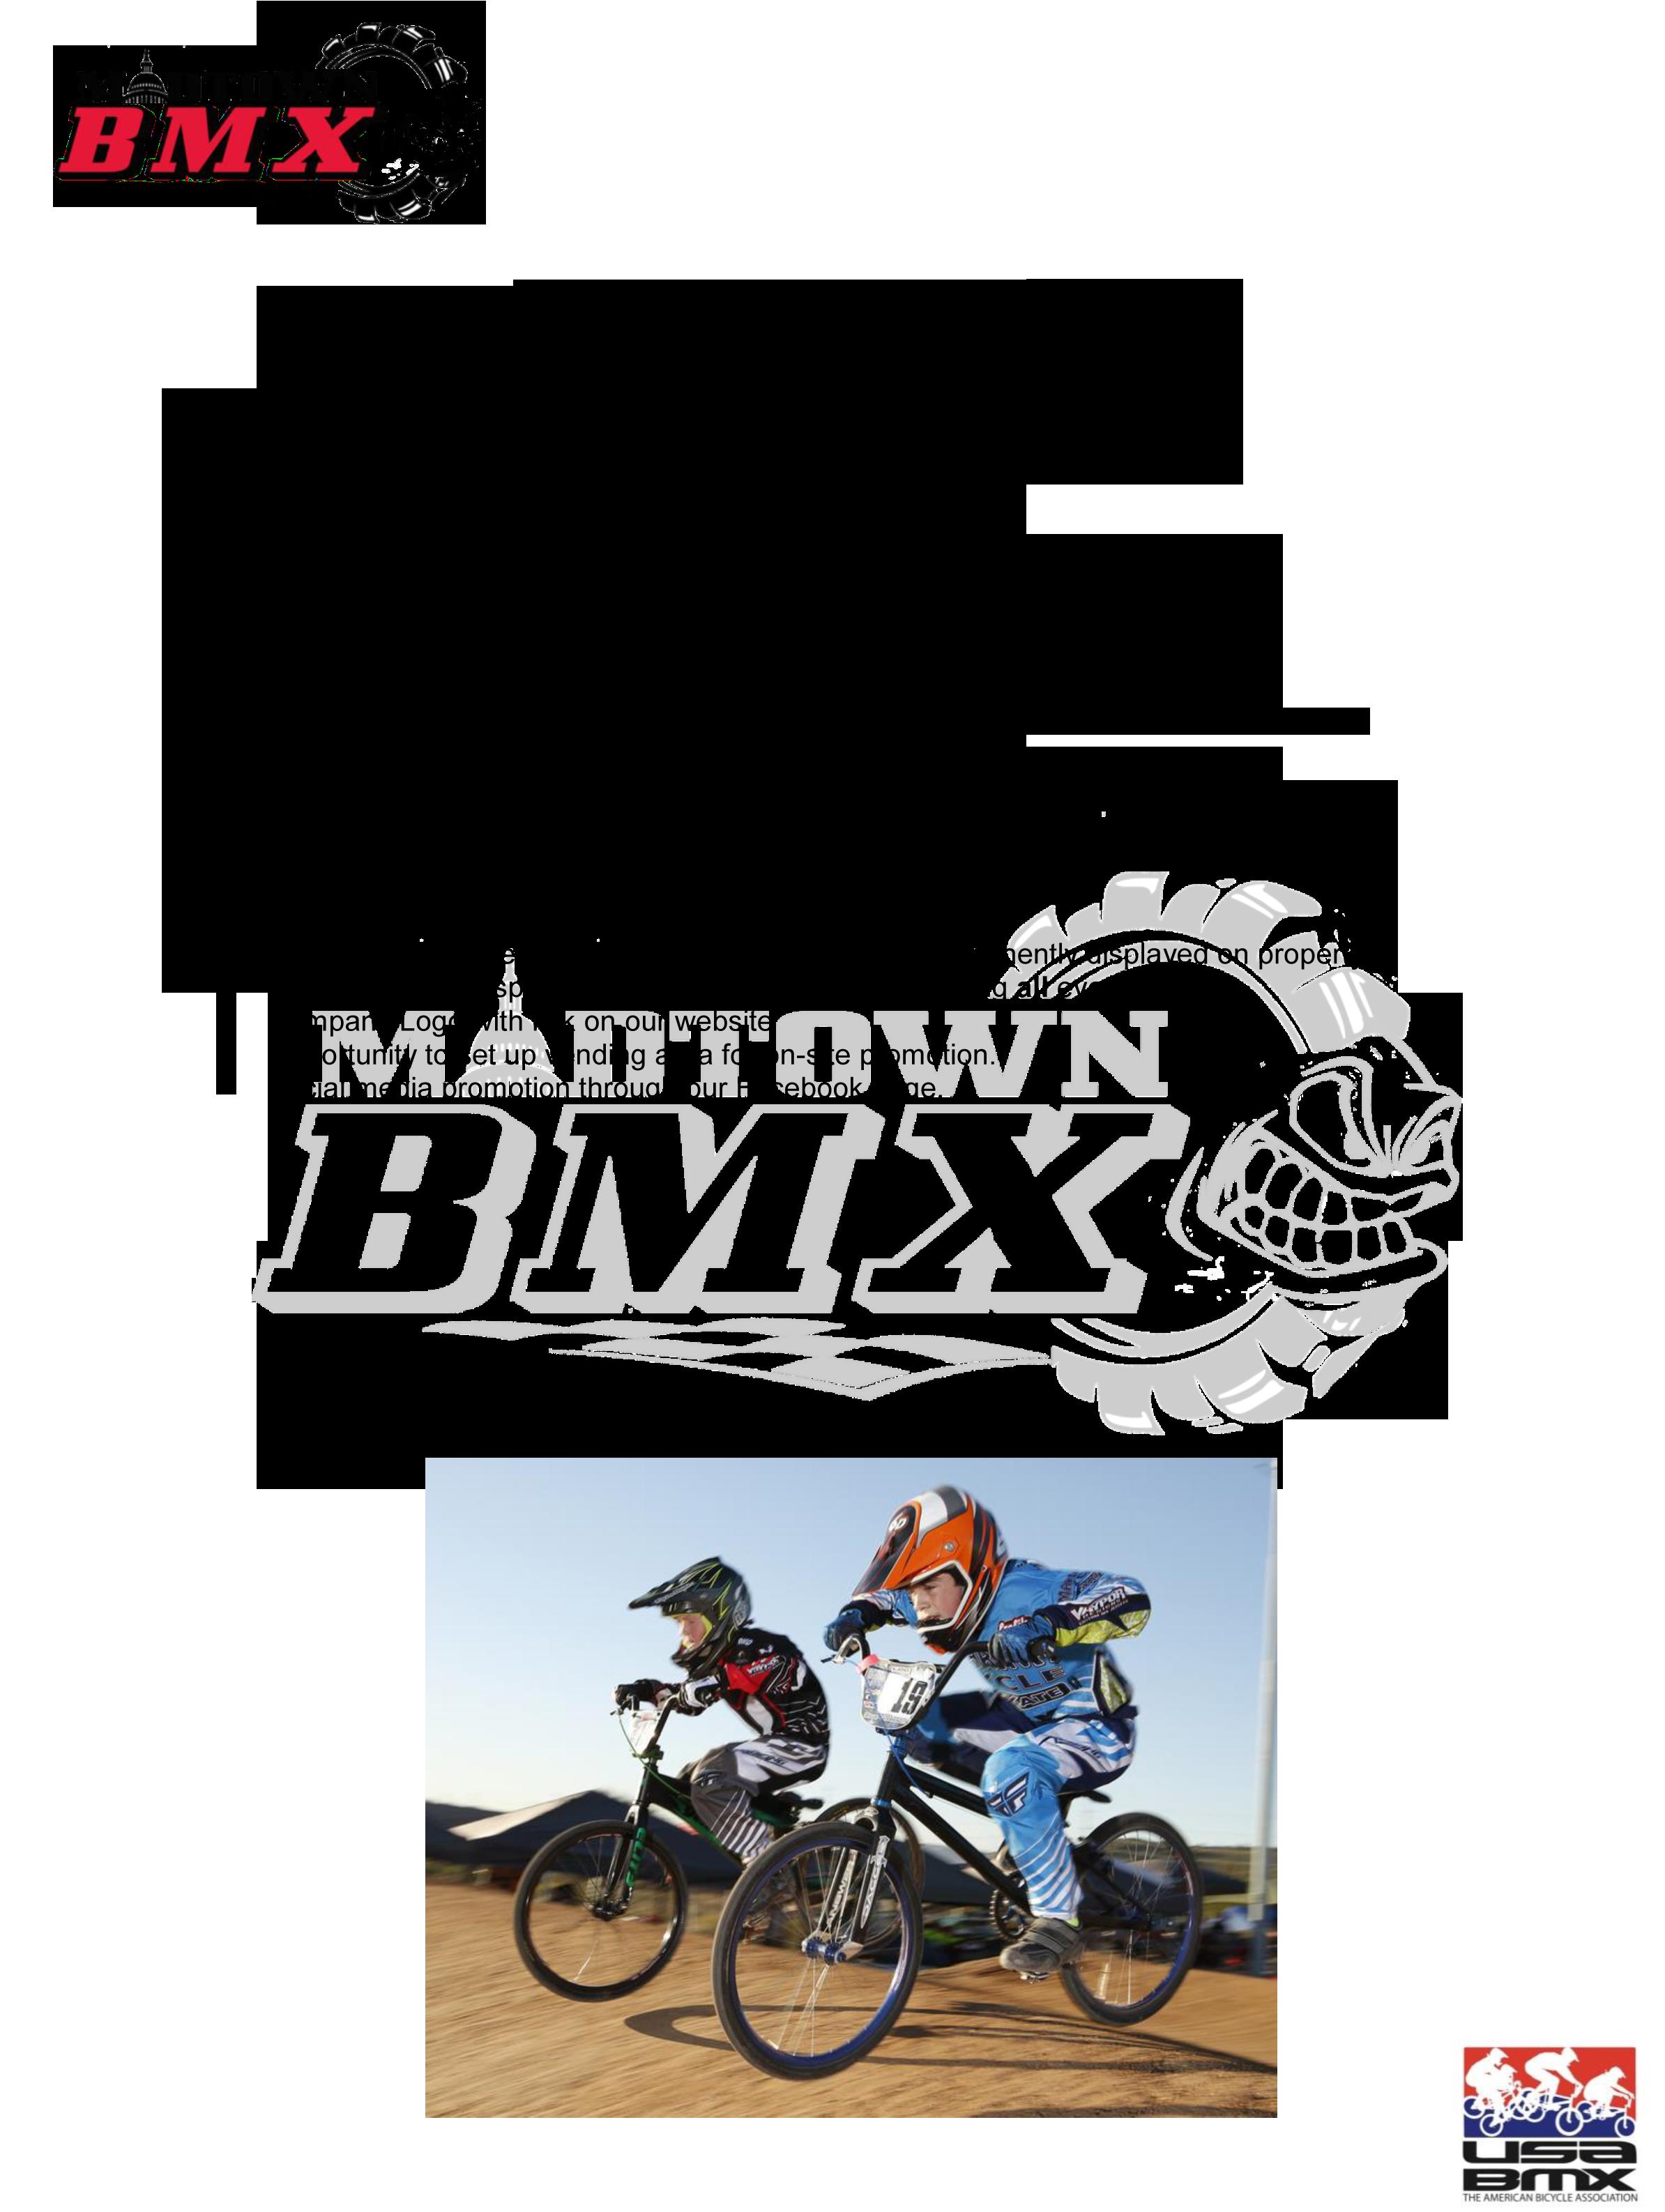 Madtown_bmx_sponsorship_program_2017-2